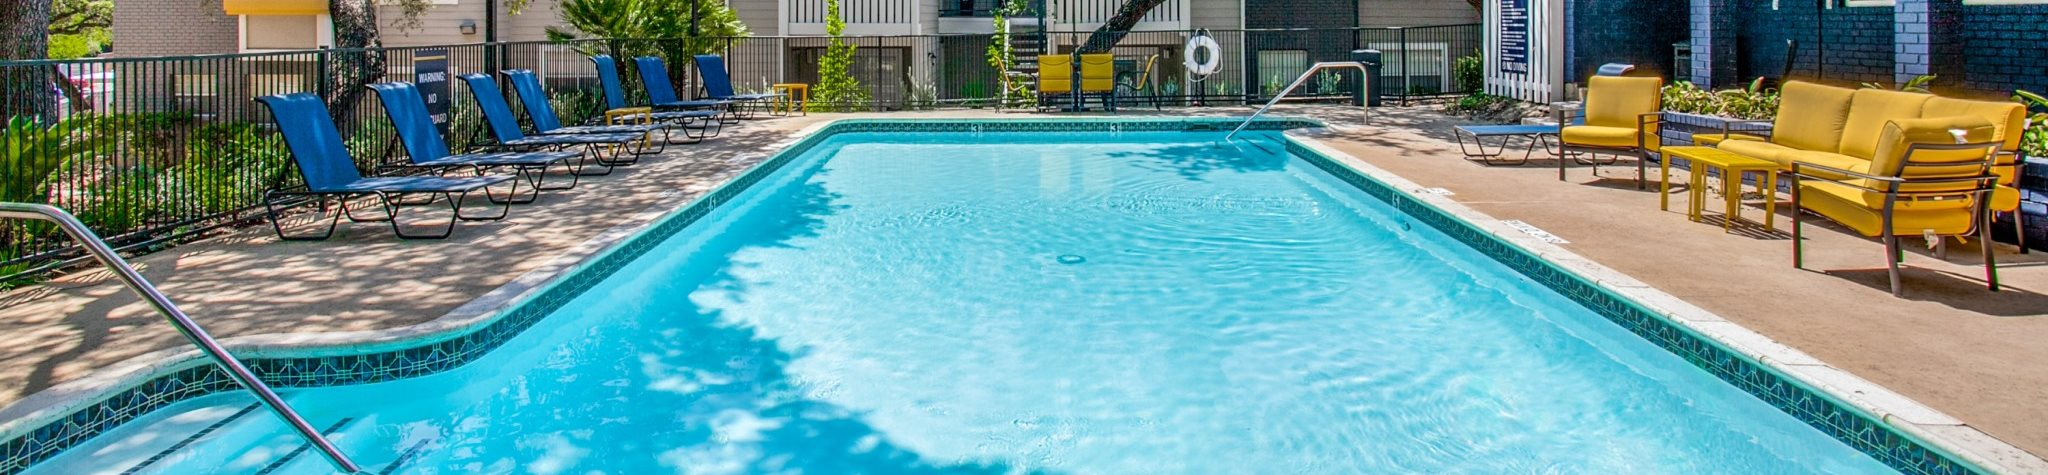 northwest san antonio apartments with a pool